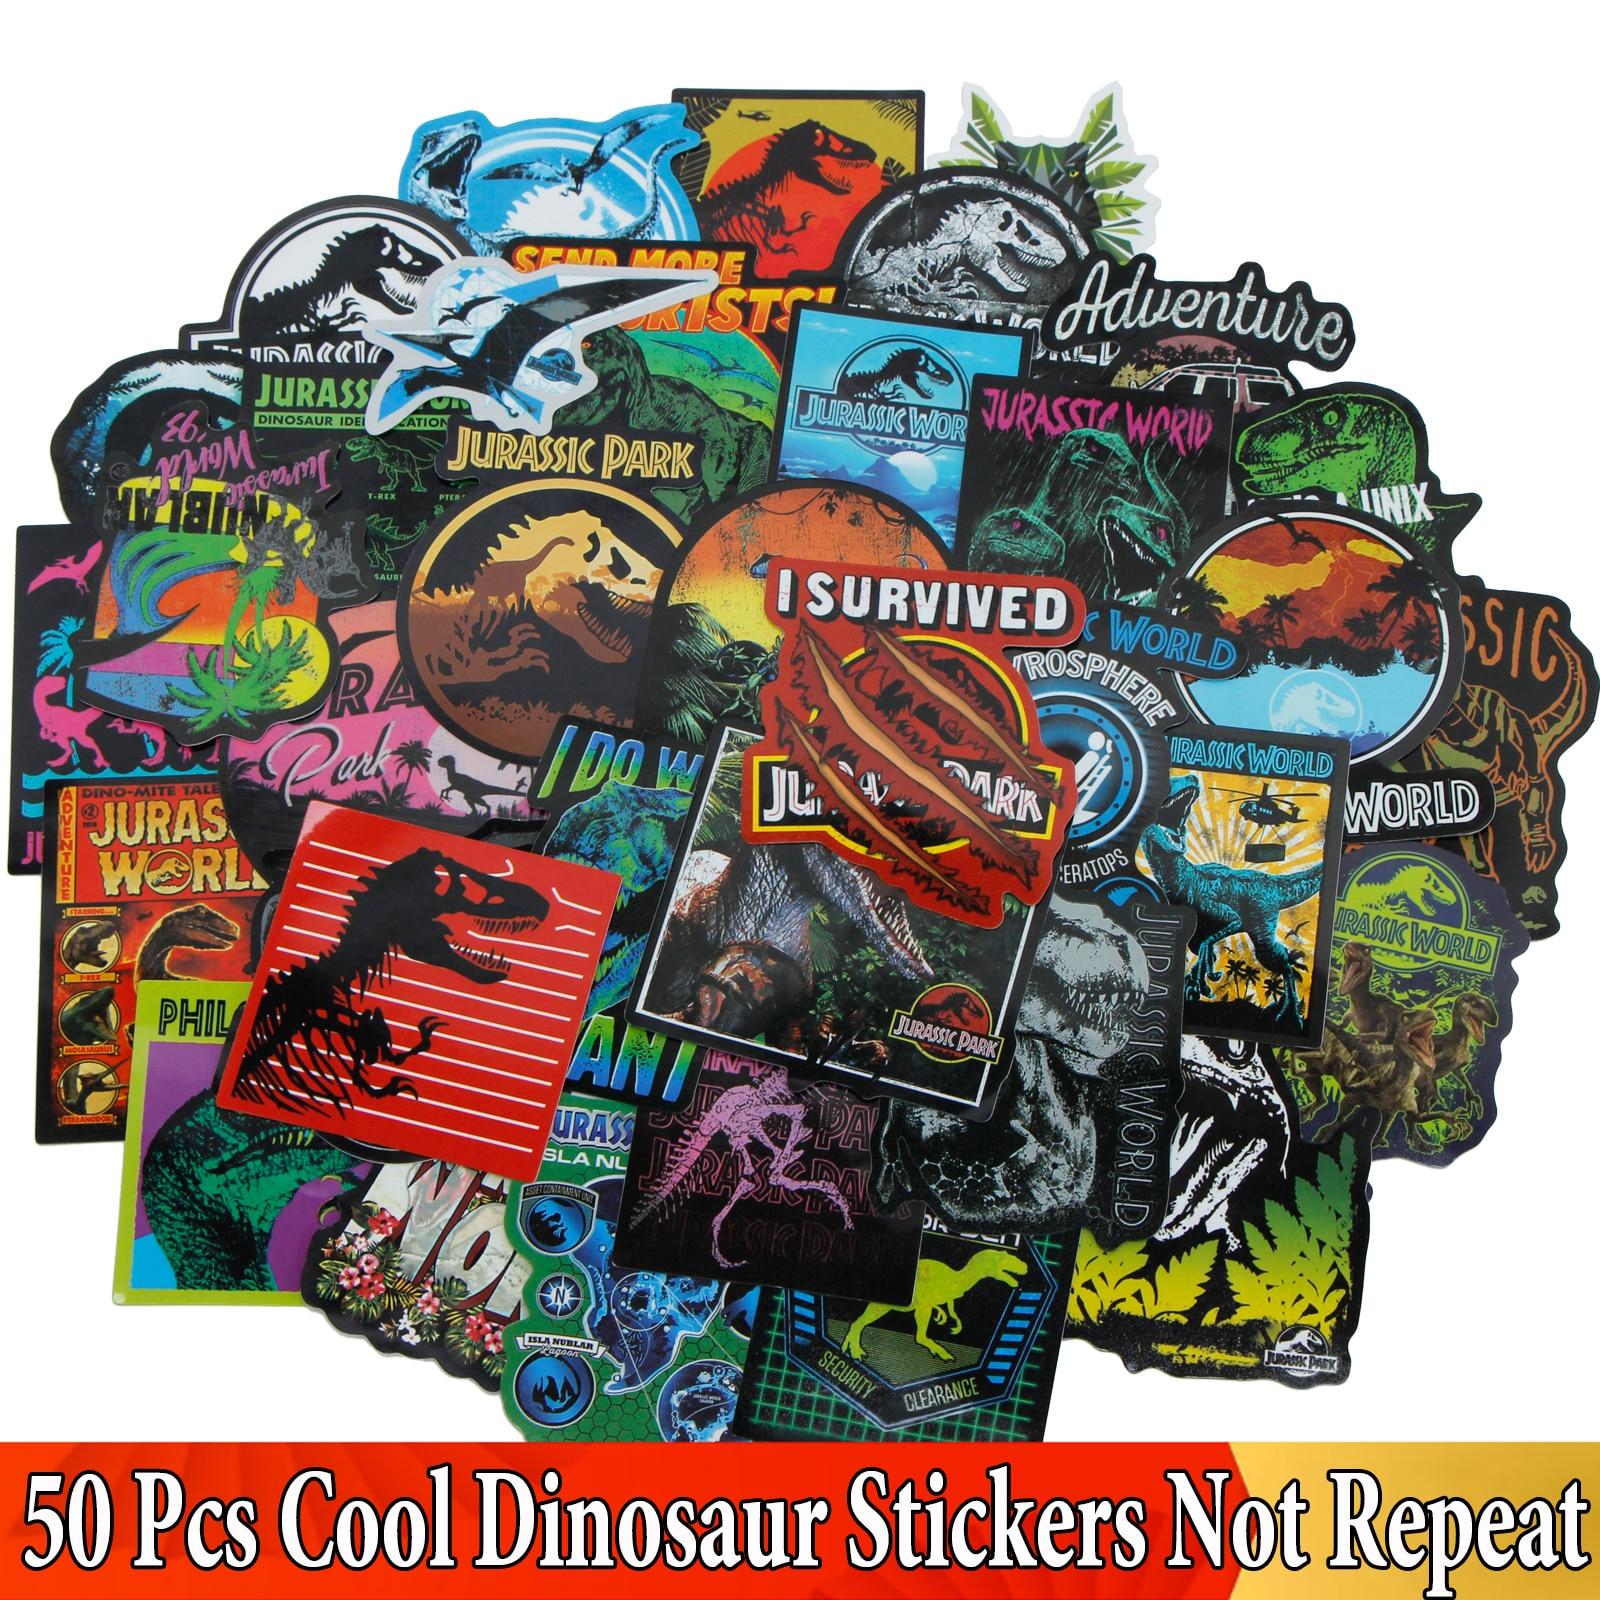 Random 50 Pcs/Lot Dinosaur JDM VSCO Sticker For Jurassic Park Graffiti Sticker For Luggage Laptop Moto Skateboard Kids DIY Toy